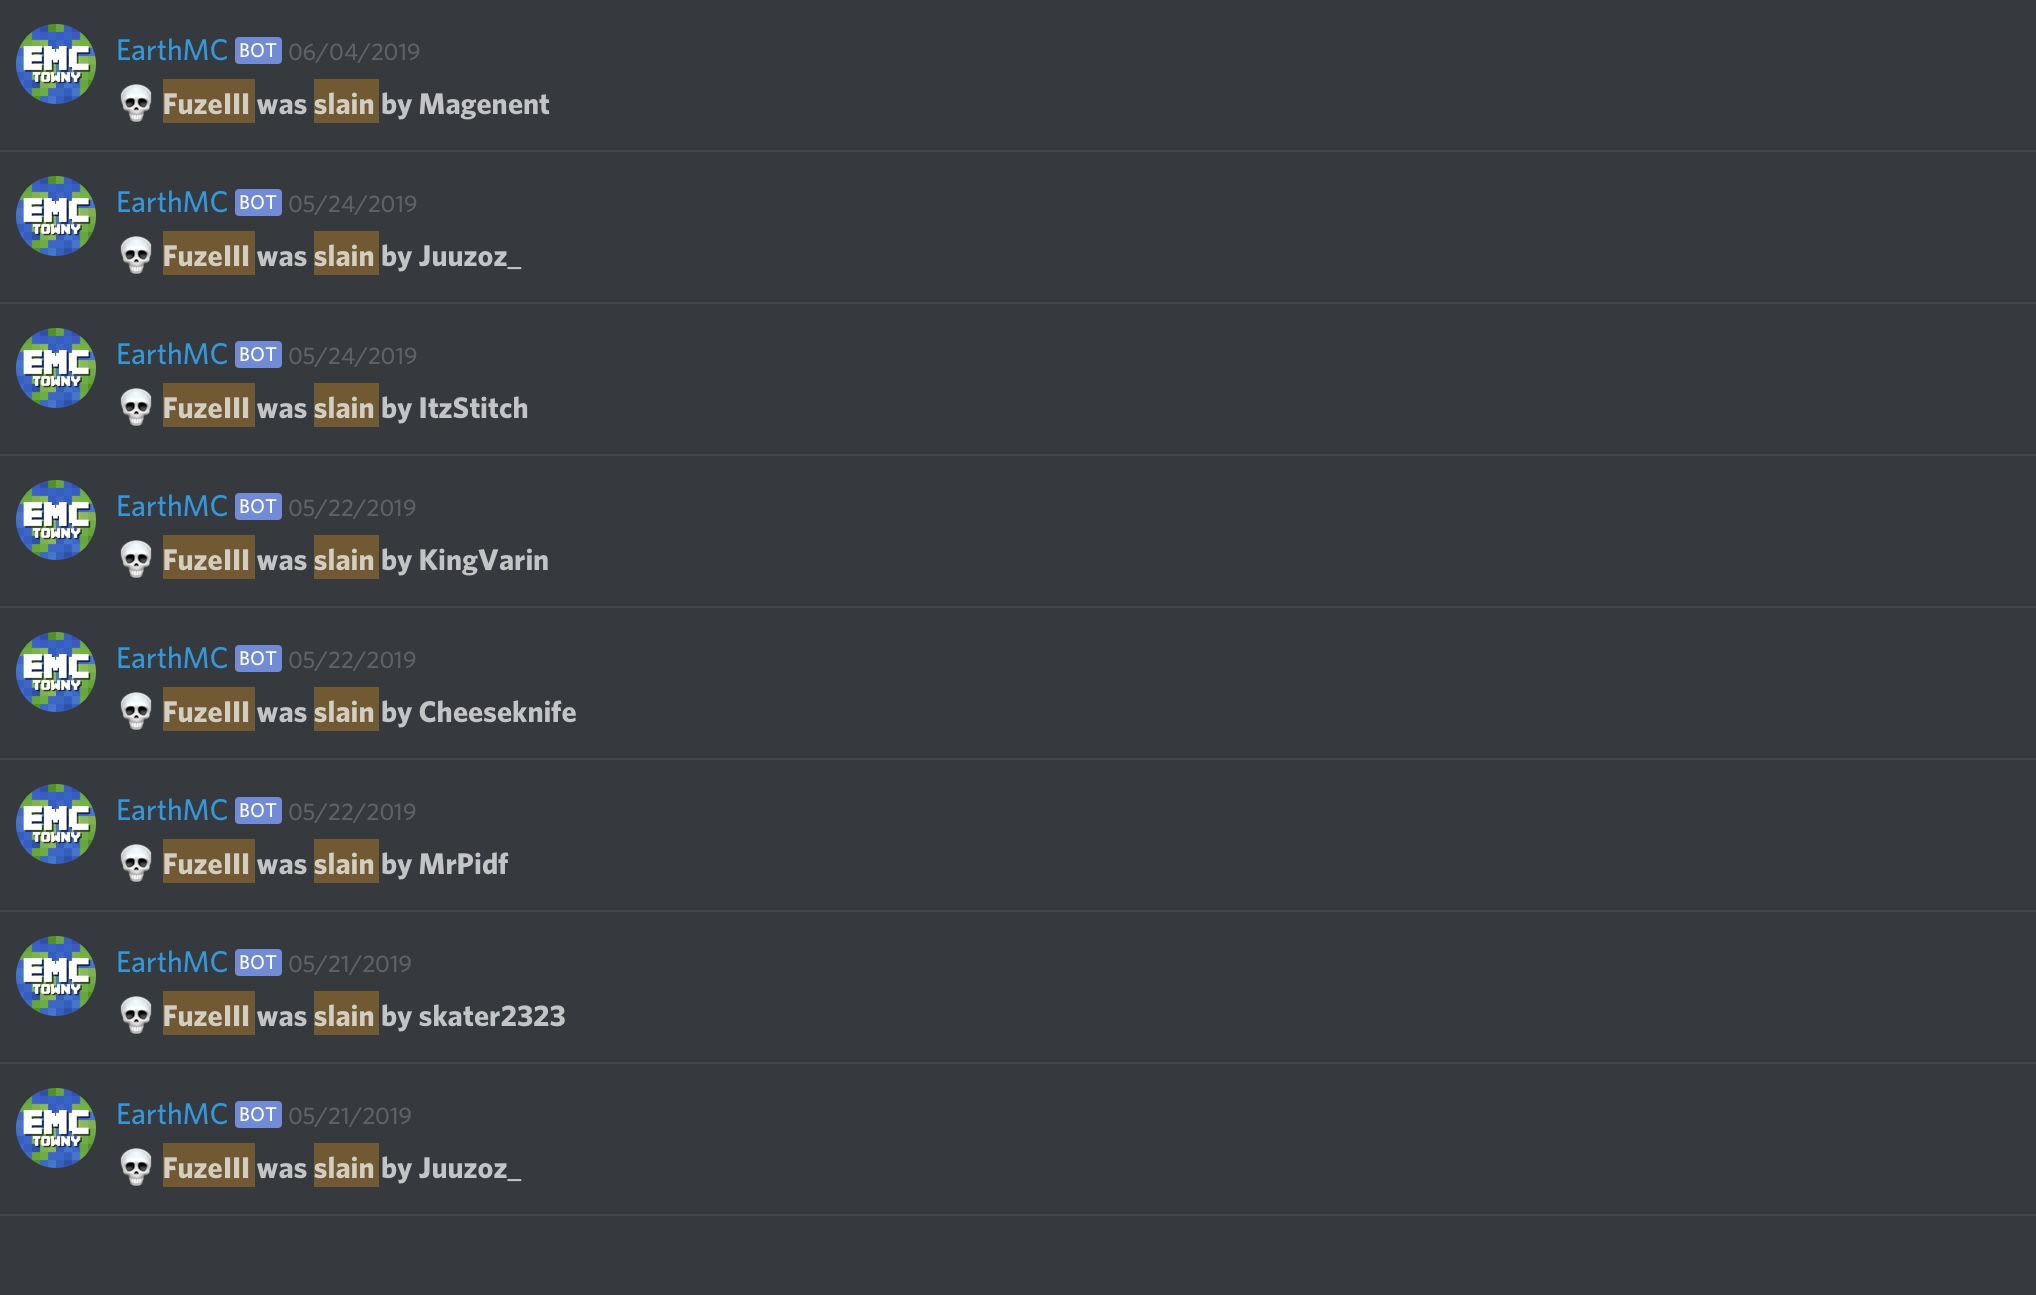 List of people that have killed FuzeIII